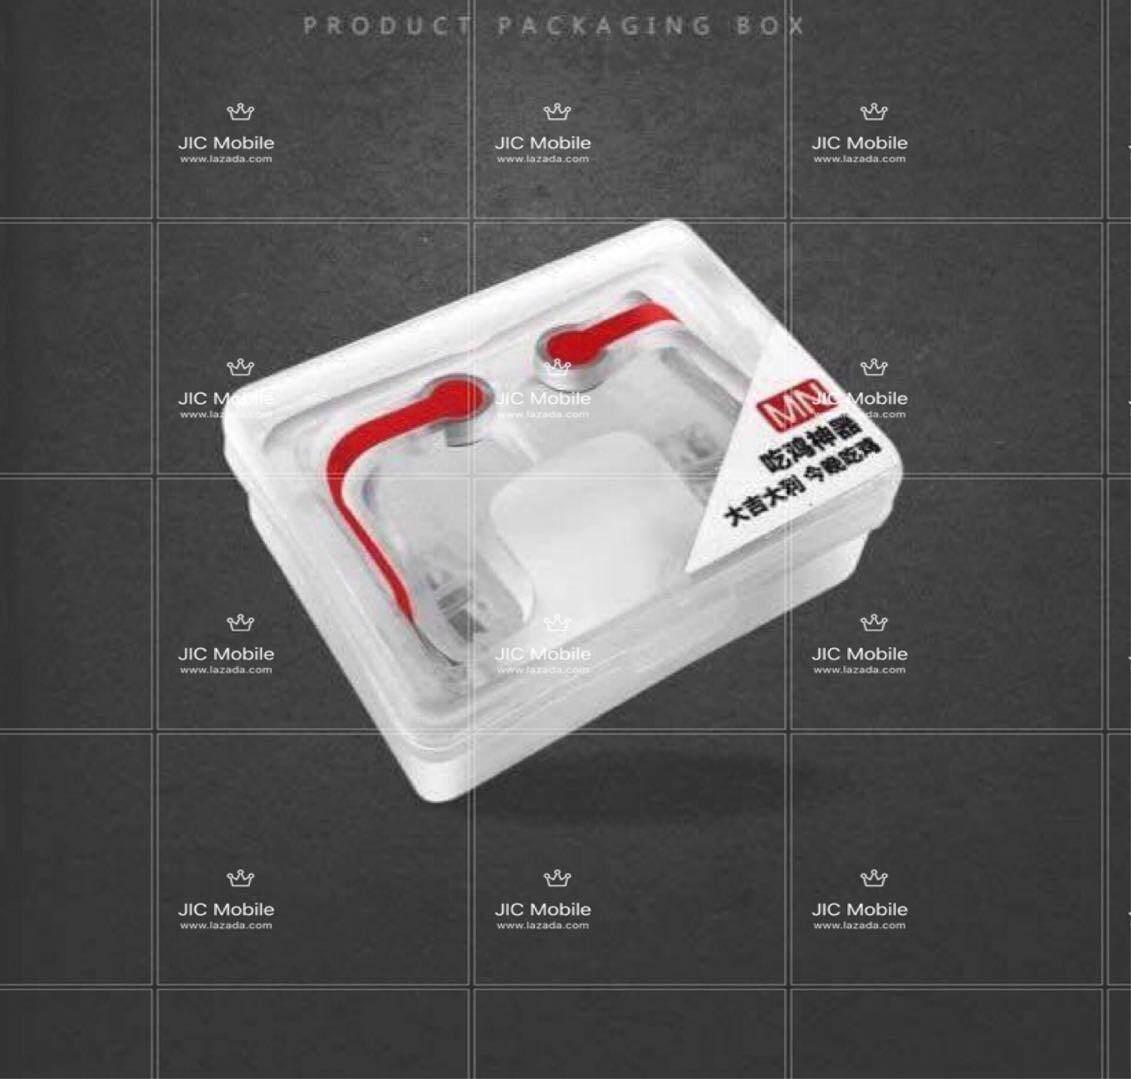 Mobile Joystick Mini Fling จอยเกมส์มือถือ รุ่นใหม่ Mn กดข้างหลัง ดีที่สุด !!! จอยเกมสำหรับเล่น Ros Pubg Freefire Knives (ได้เป็นคู่) 1 Pair-Mn.